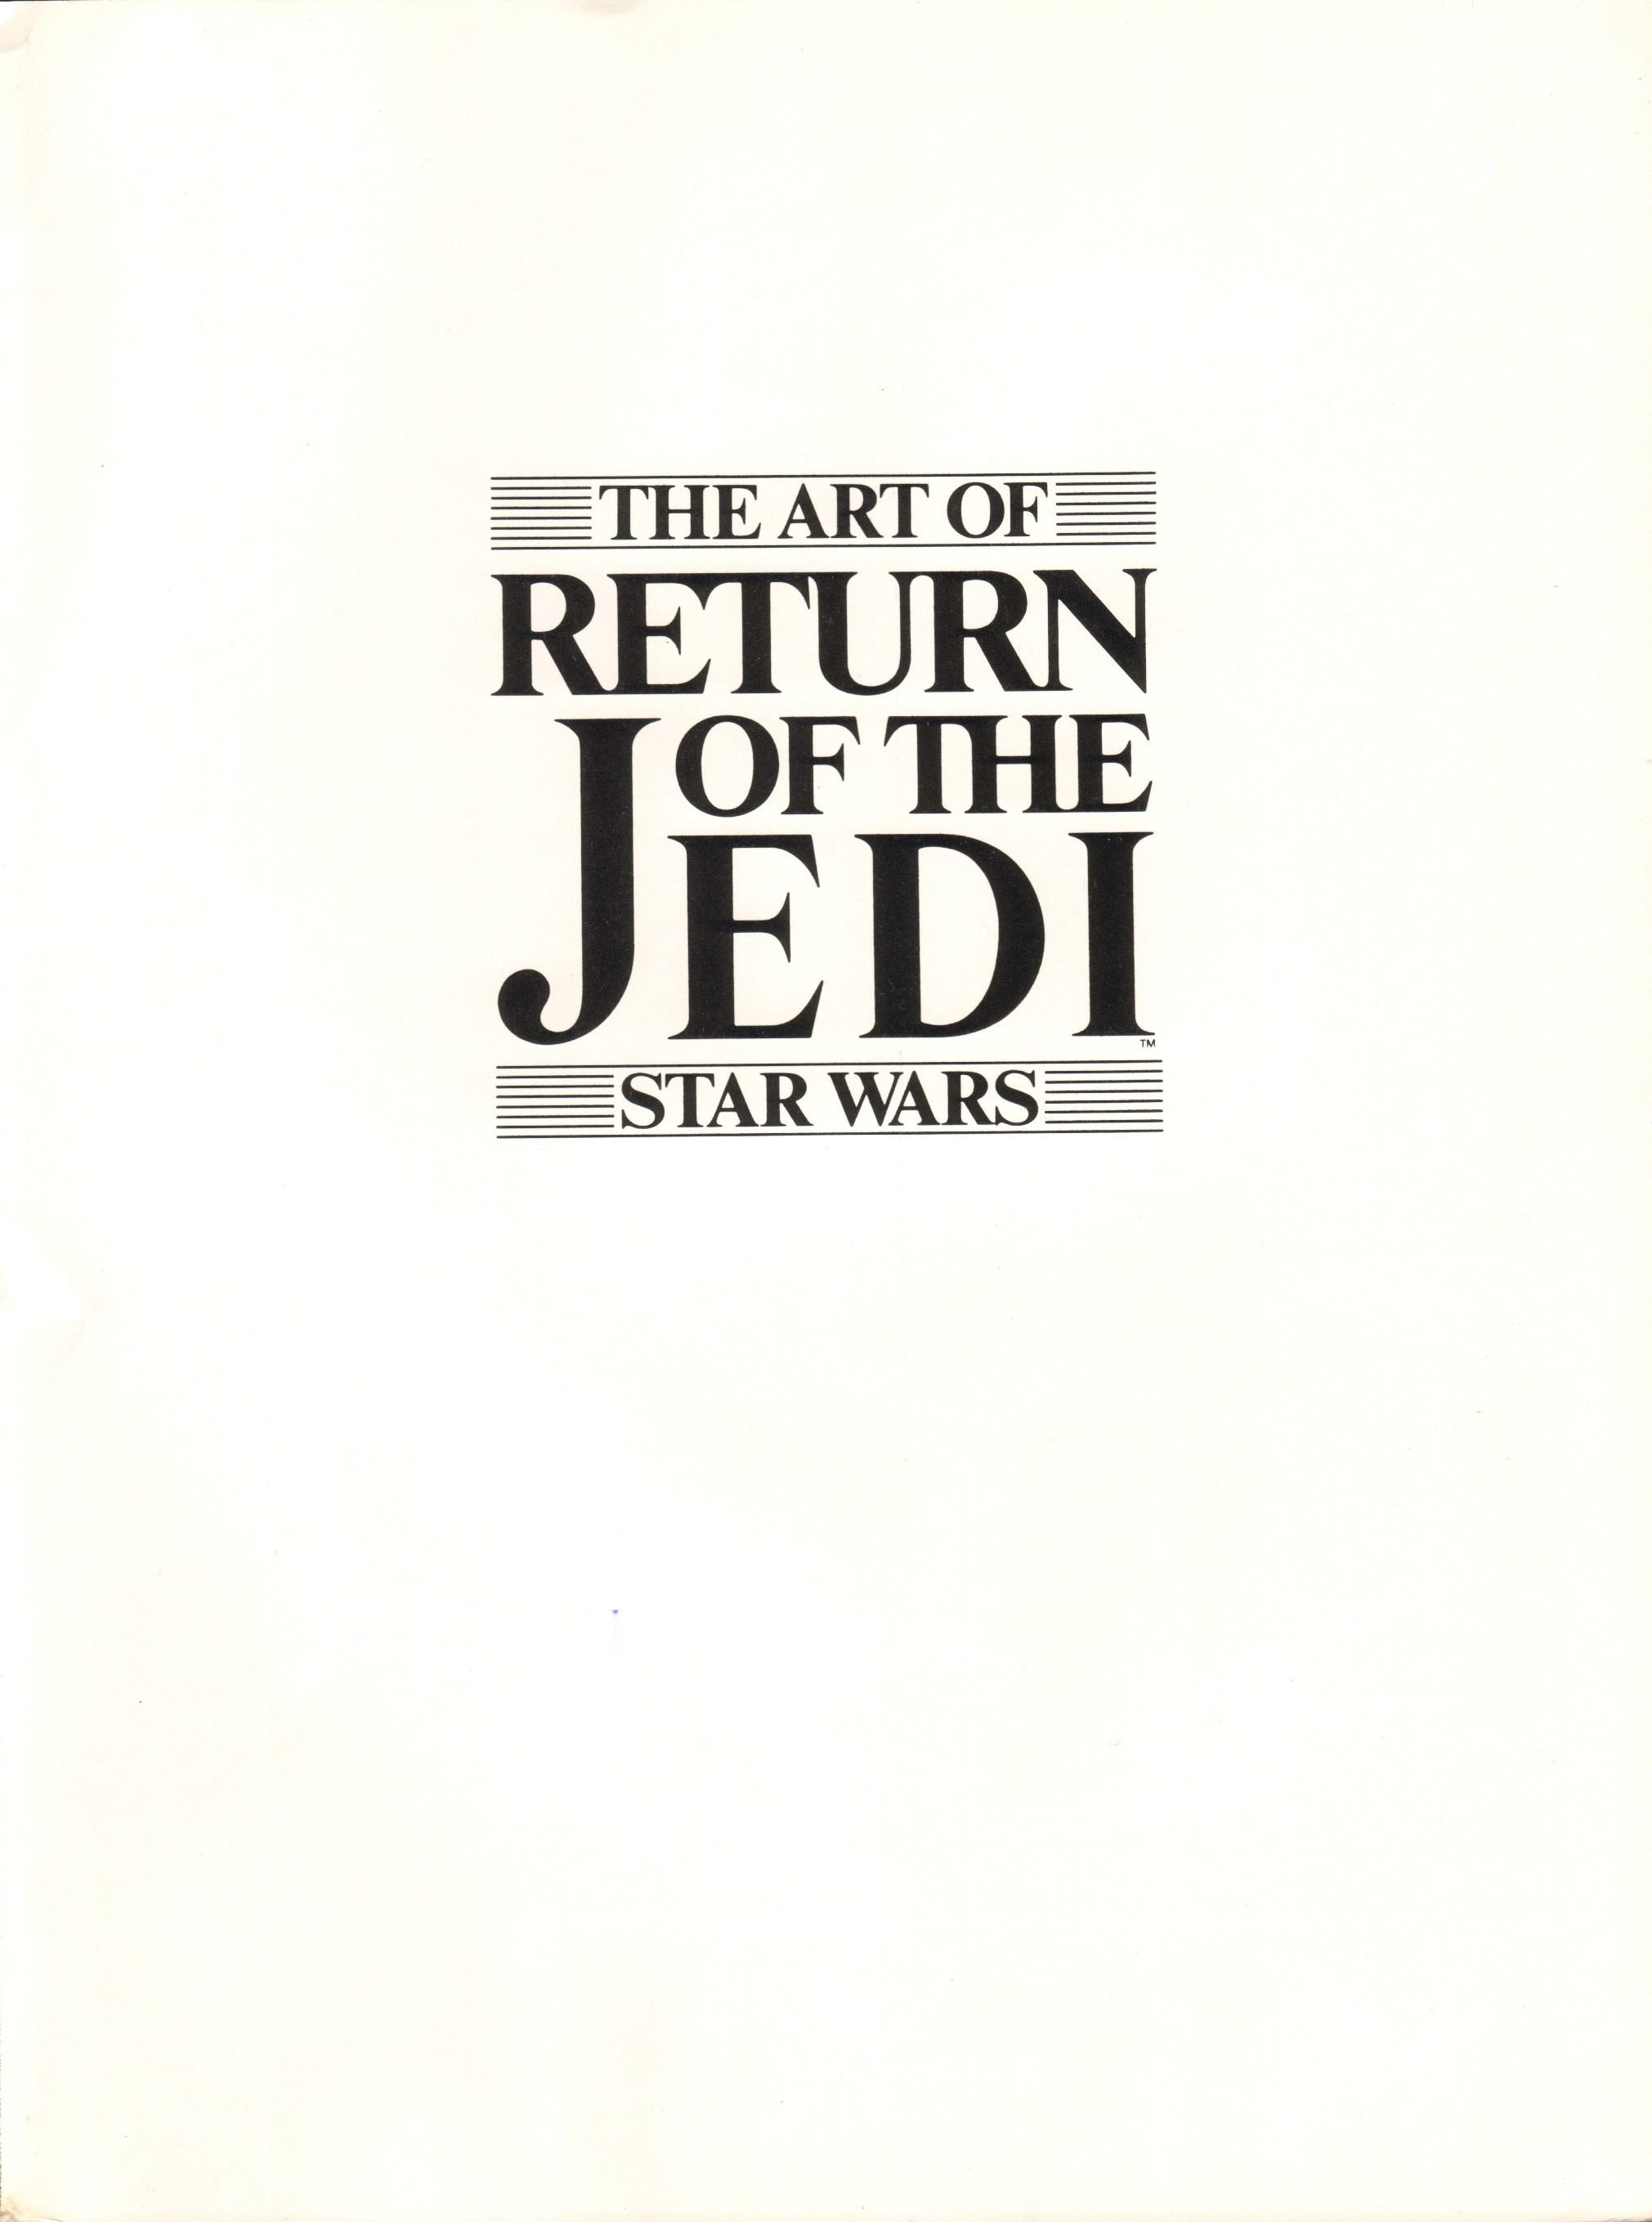 Art of Return of the Jedi (b0bafett_Empire)-p001